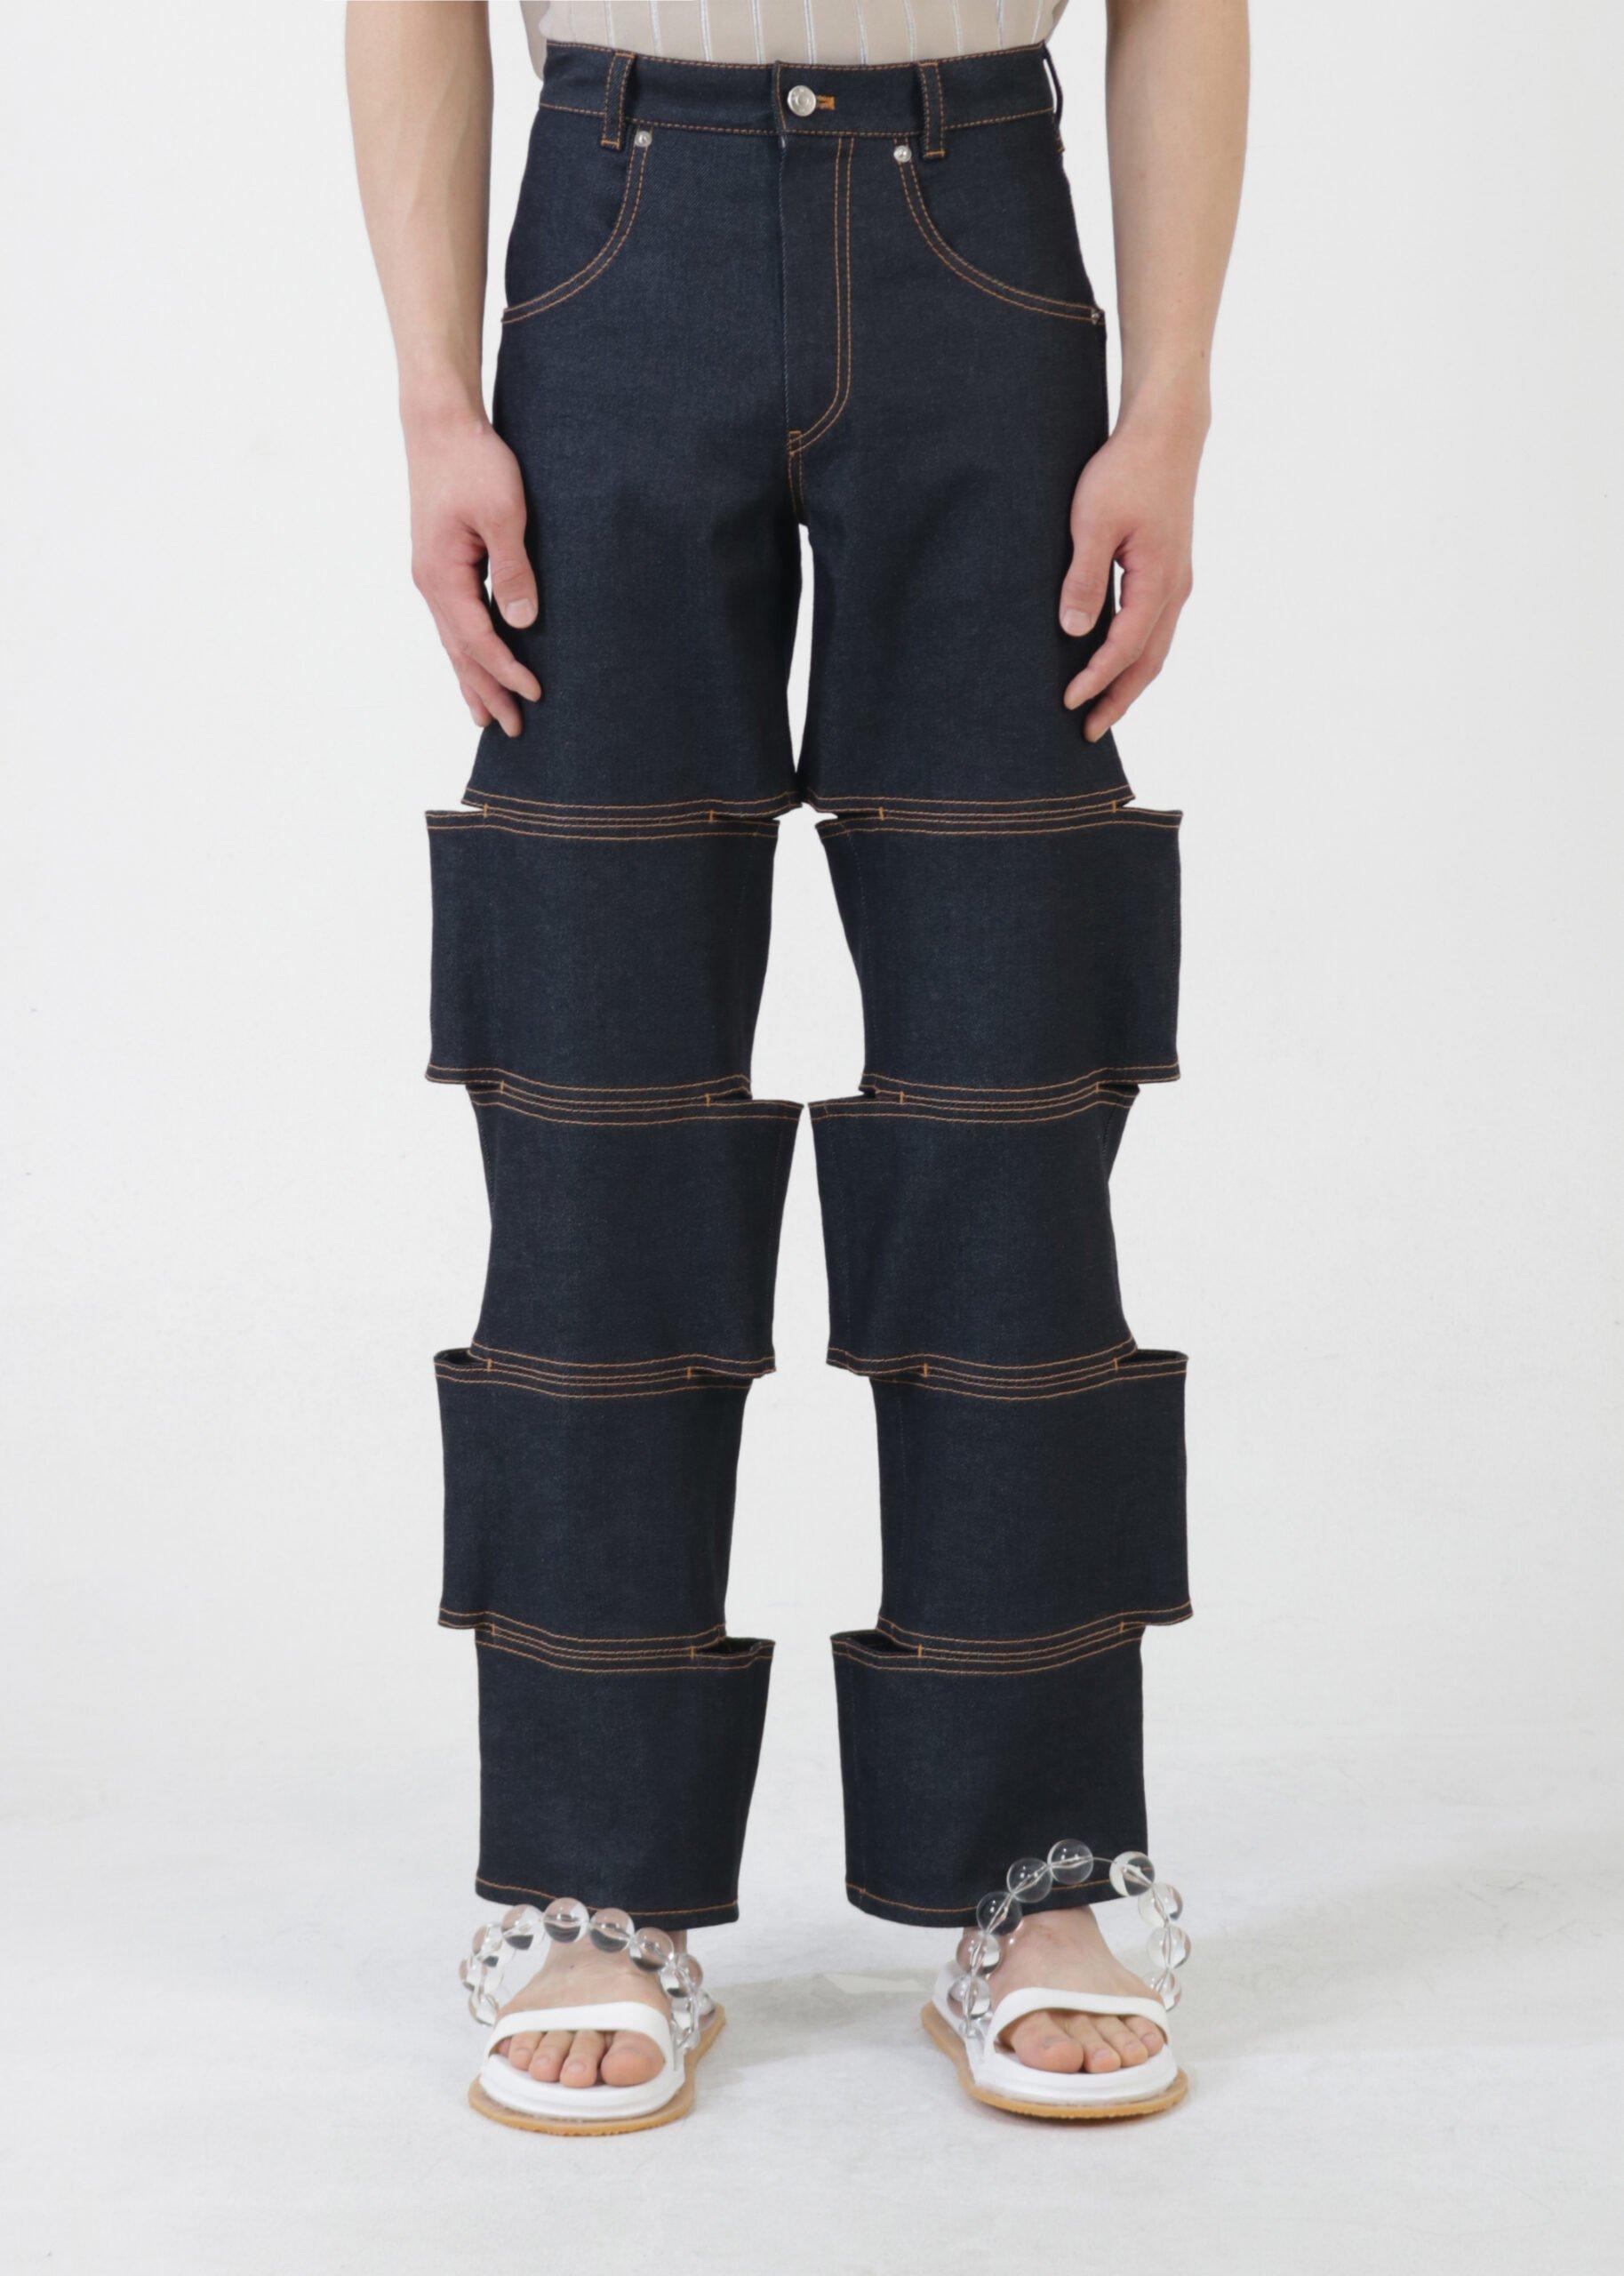 l pants dark 1 scaled 1